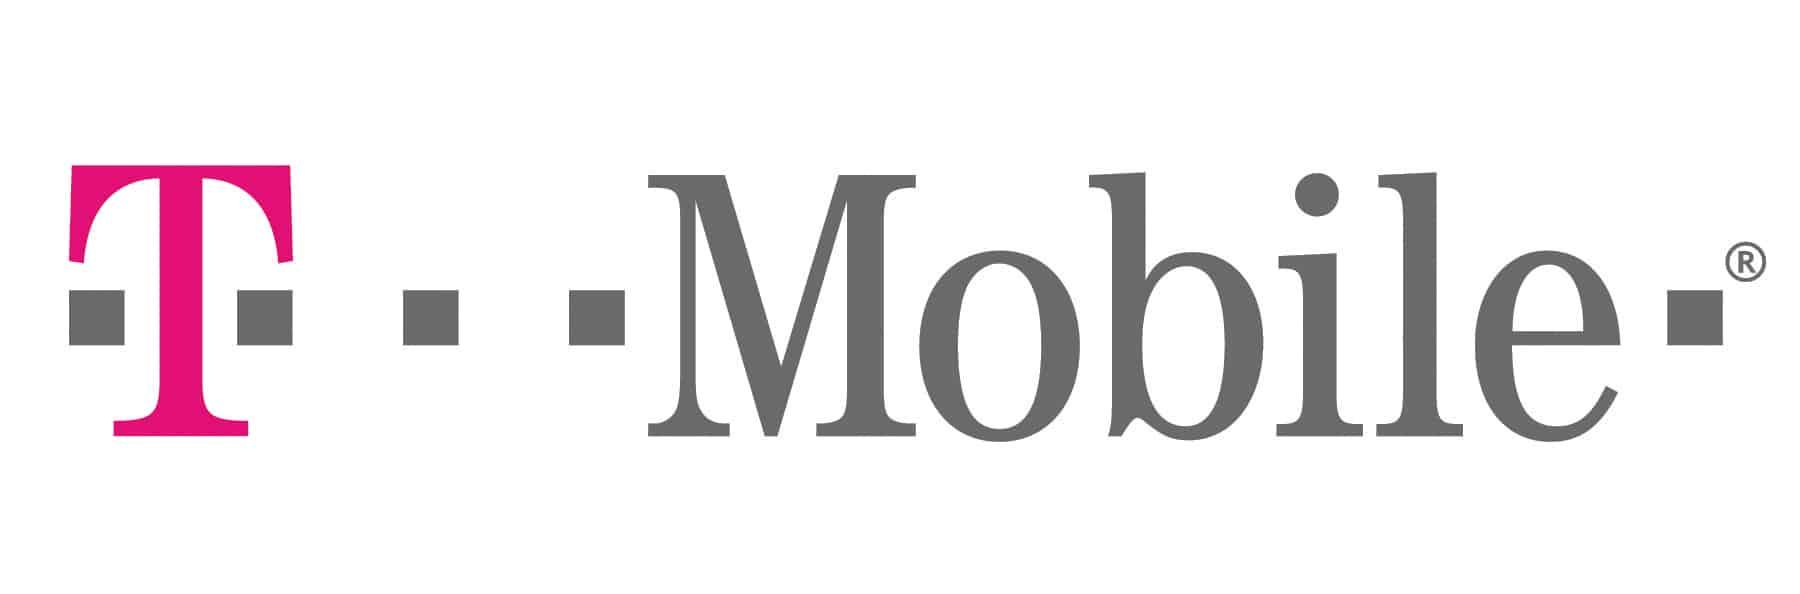 Title Sponsor Logo: T-Mobile